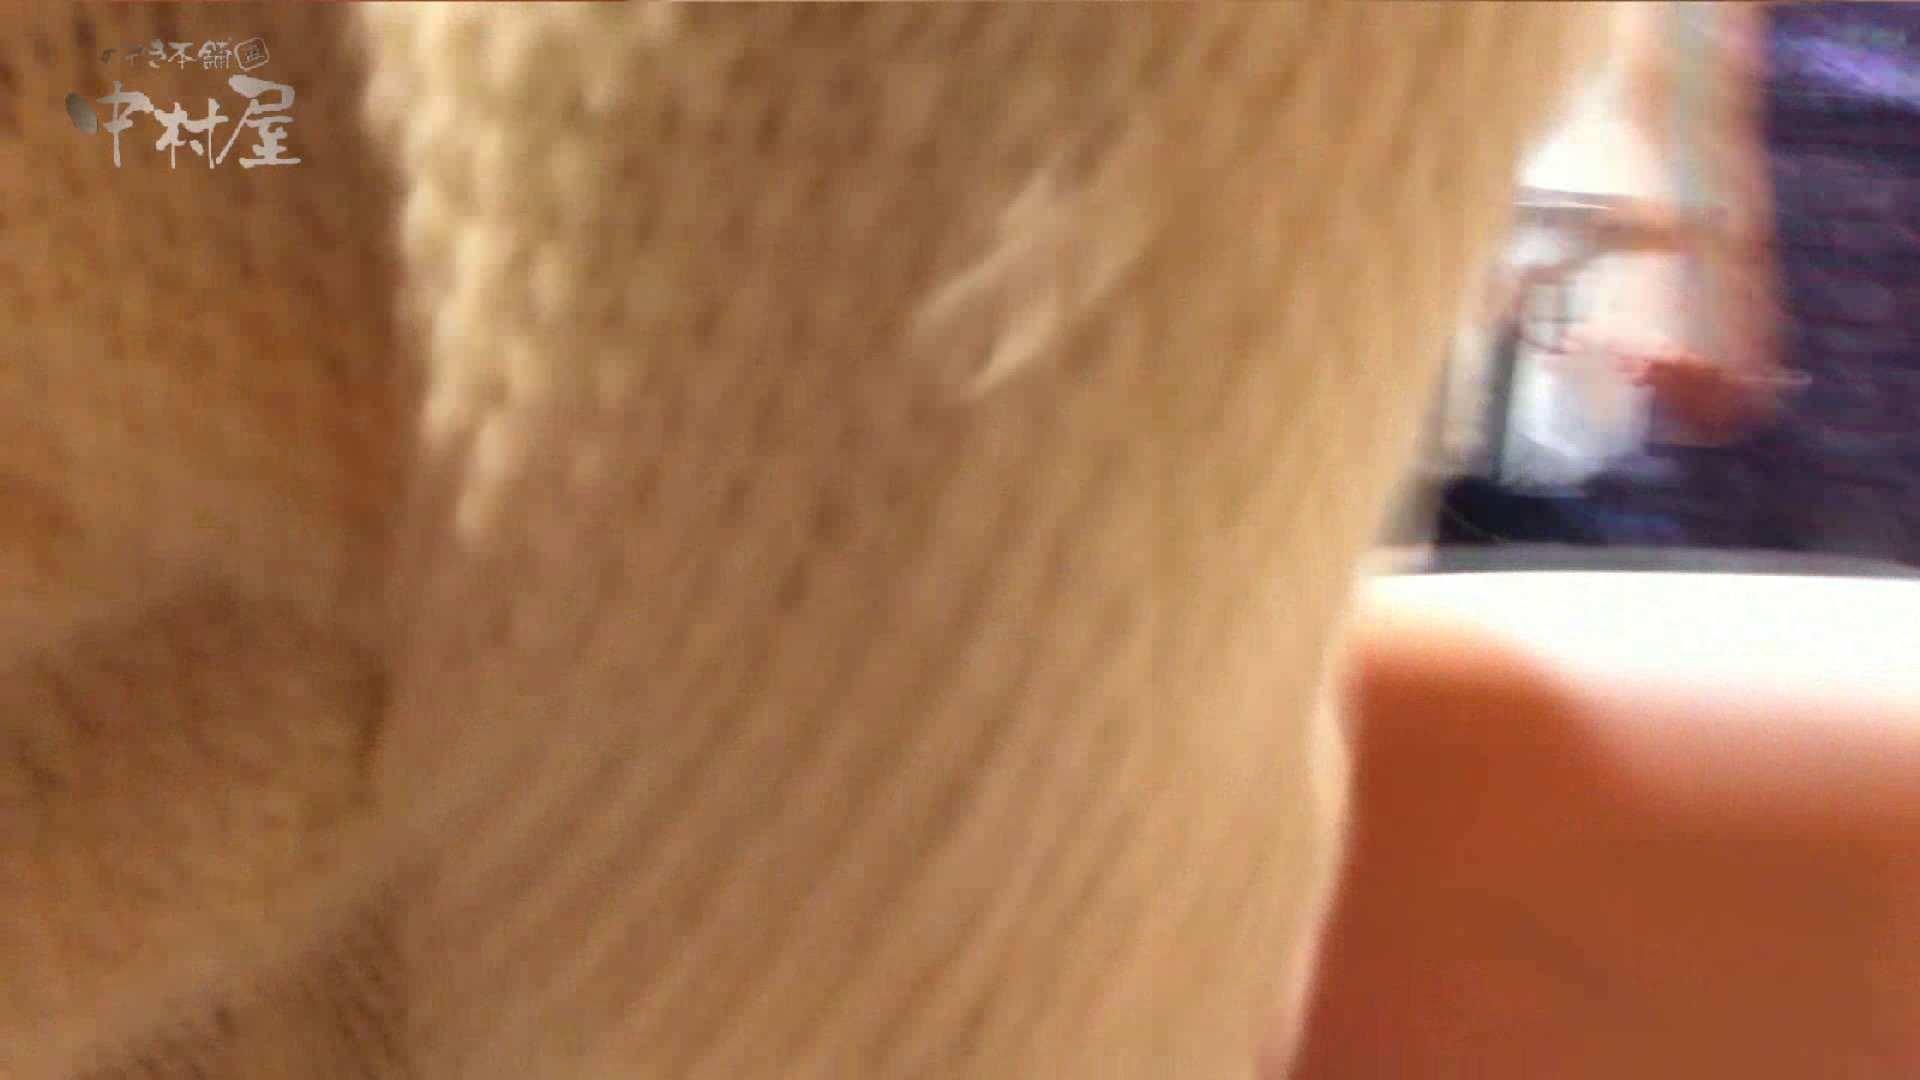 vol.73 美人アパレル胸チラ&パンチラ 目の下のホクロがエッチな店員さん エッチ見放題 おまんこ動画流出 84PIX 49